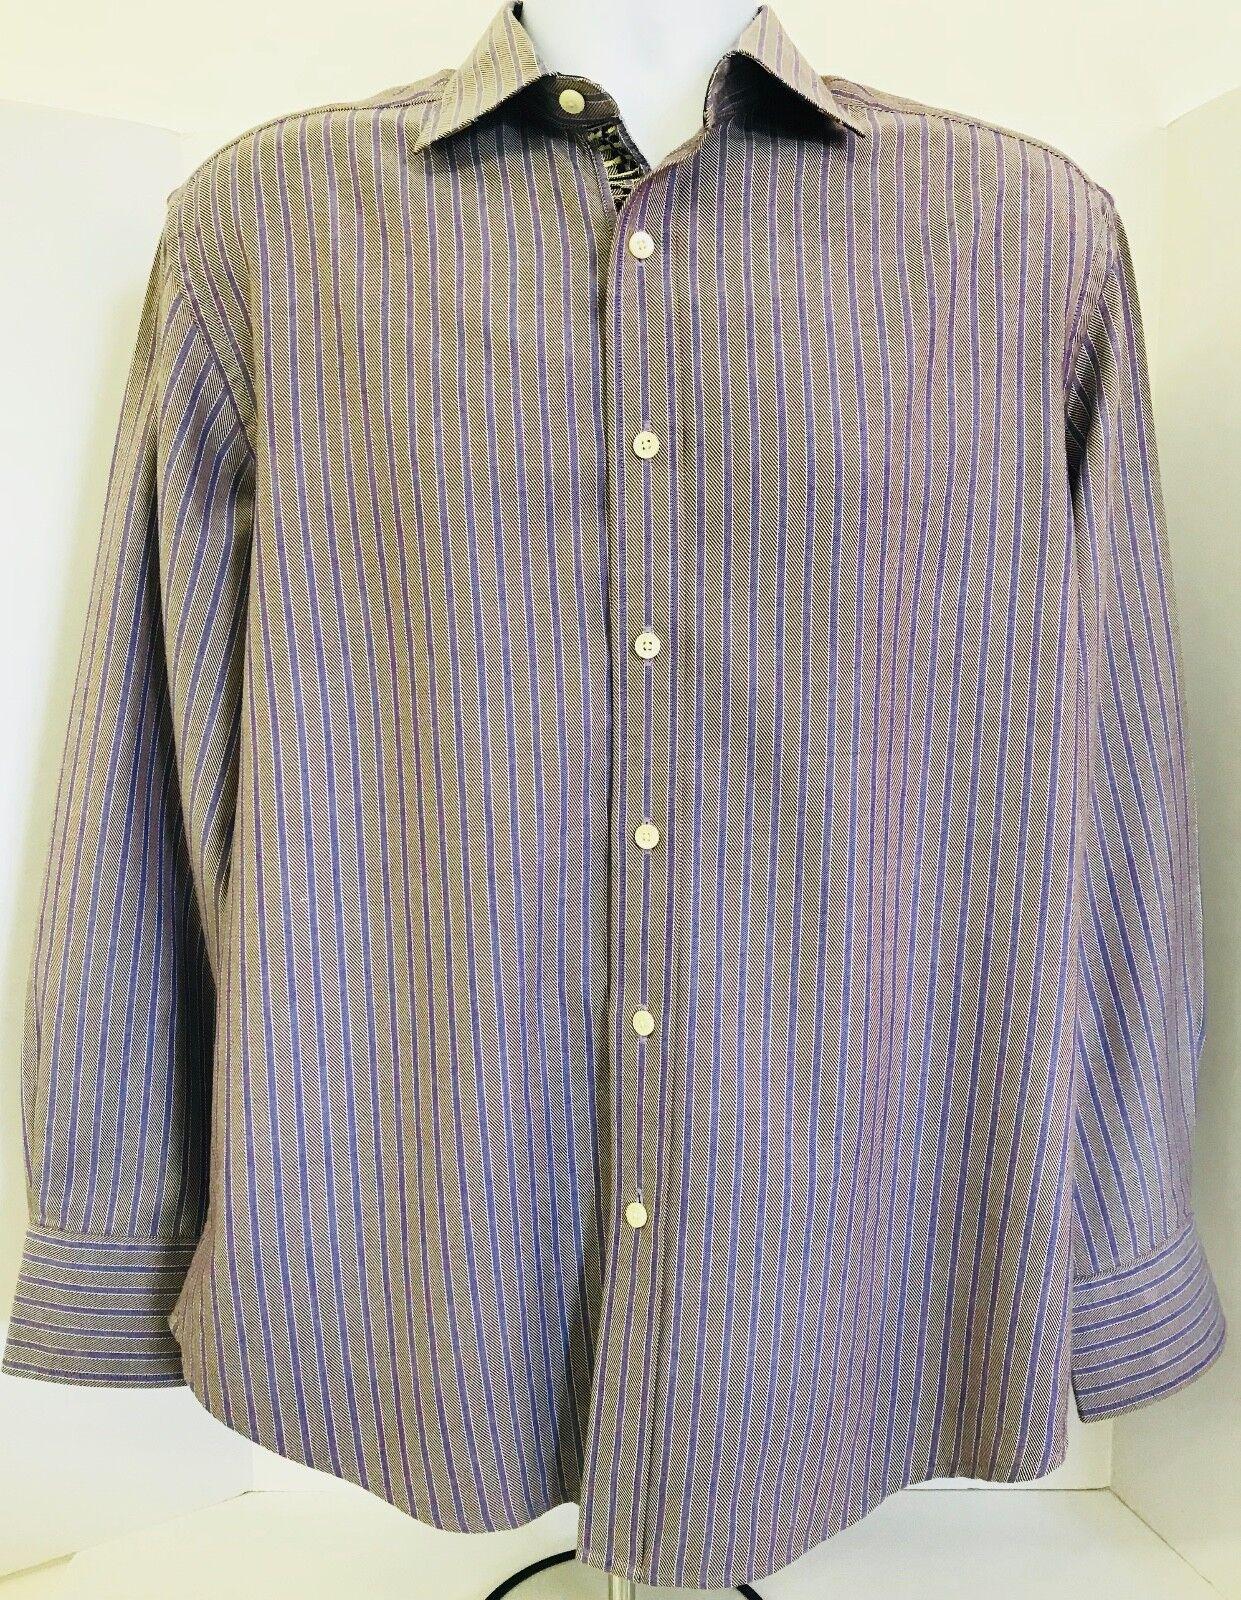 Shirt Robert Striped Flip Tan Lg Floral Long Cuff Contrast Graham htsxdCQr